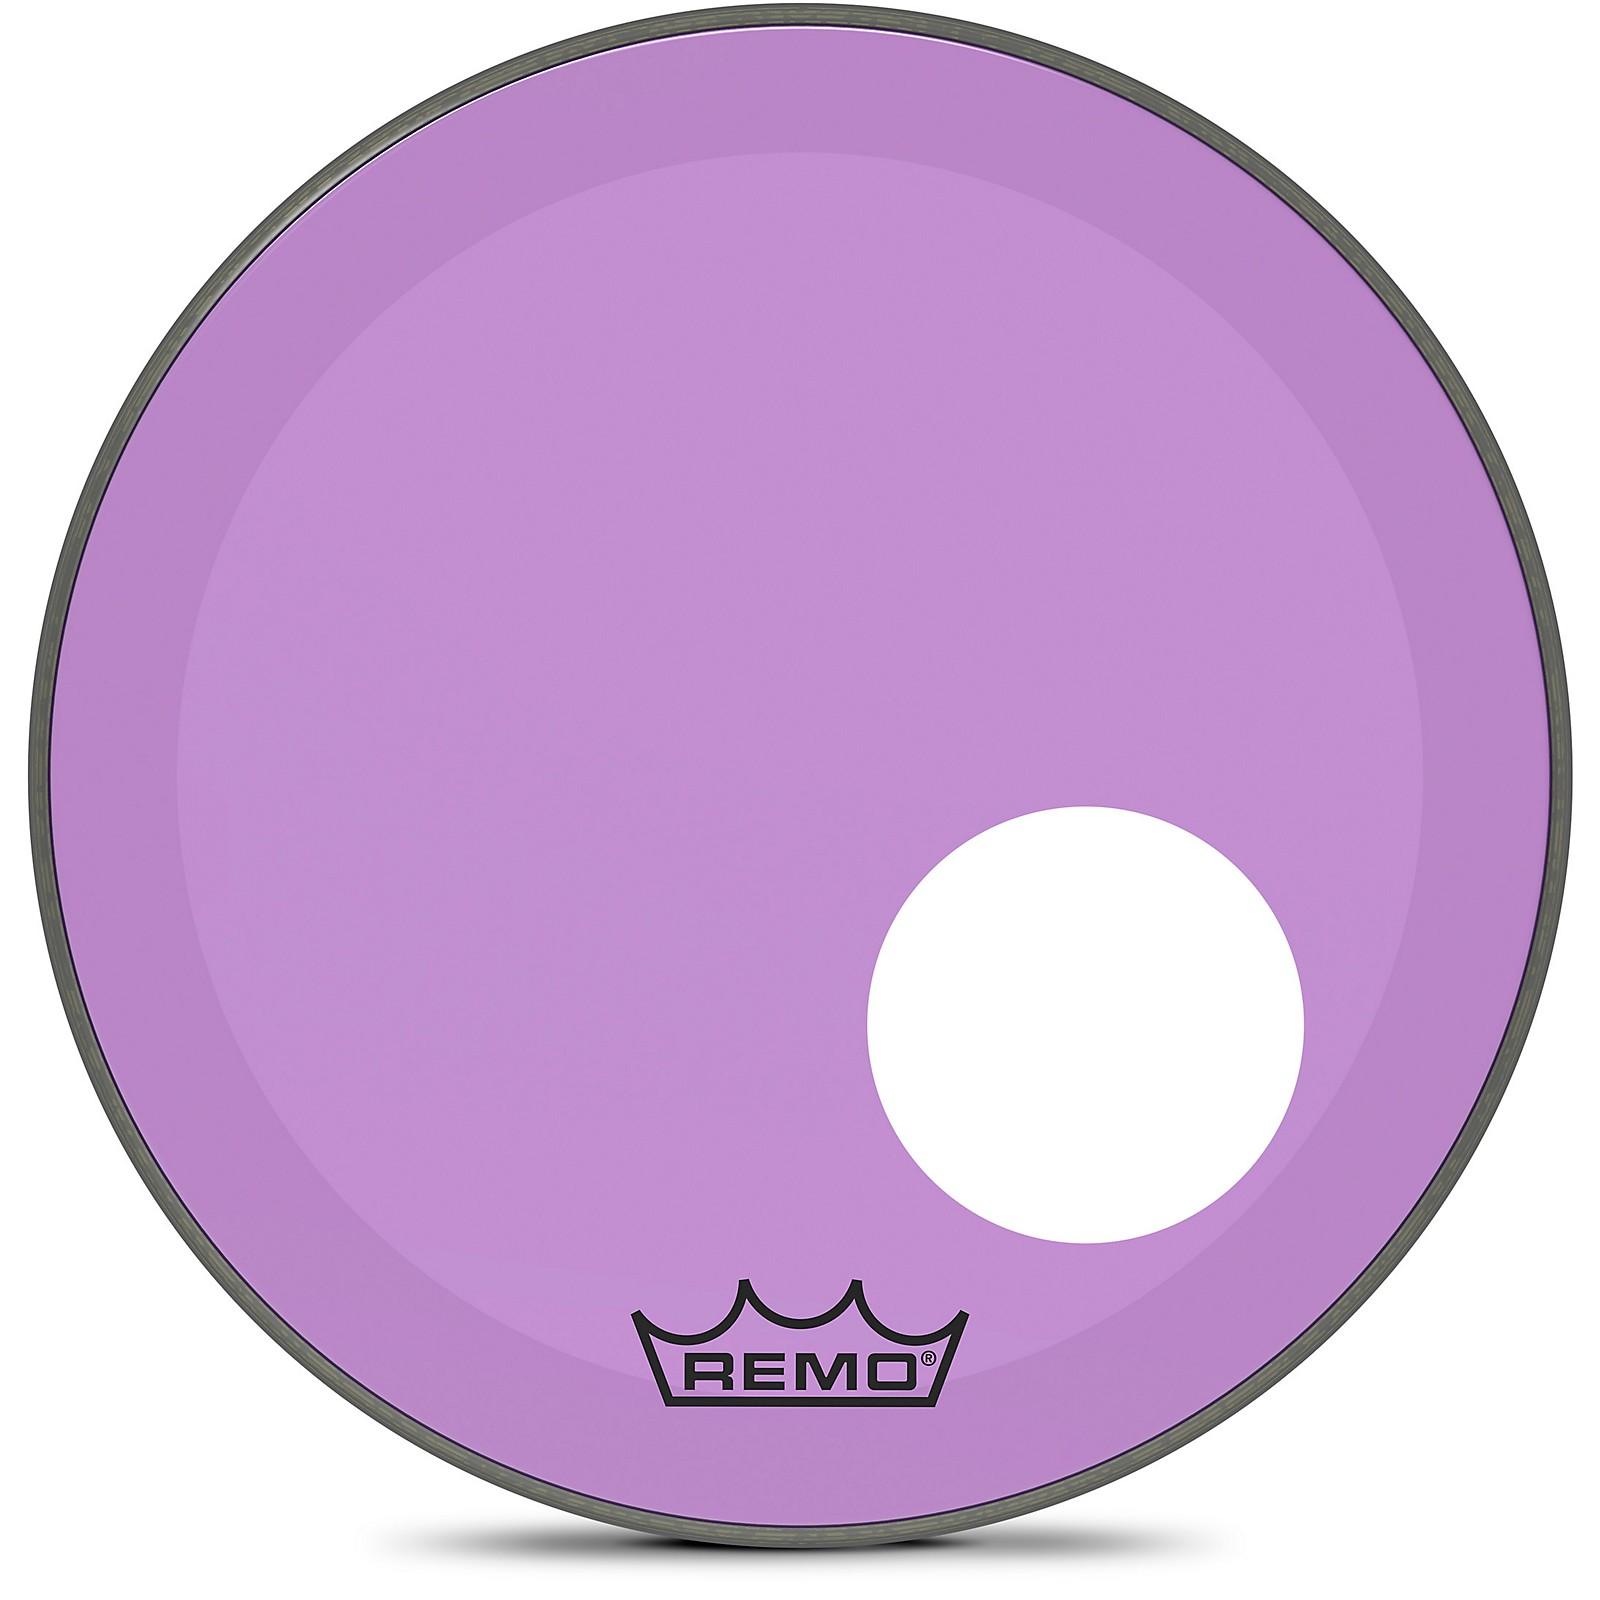 Remo Powerstroke P3 Colortone Purple Resonant Bass Drum Head with 5